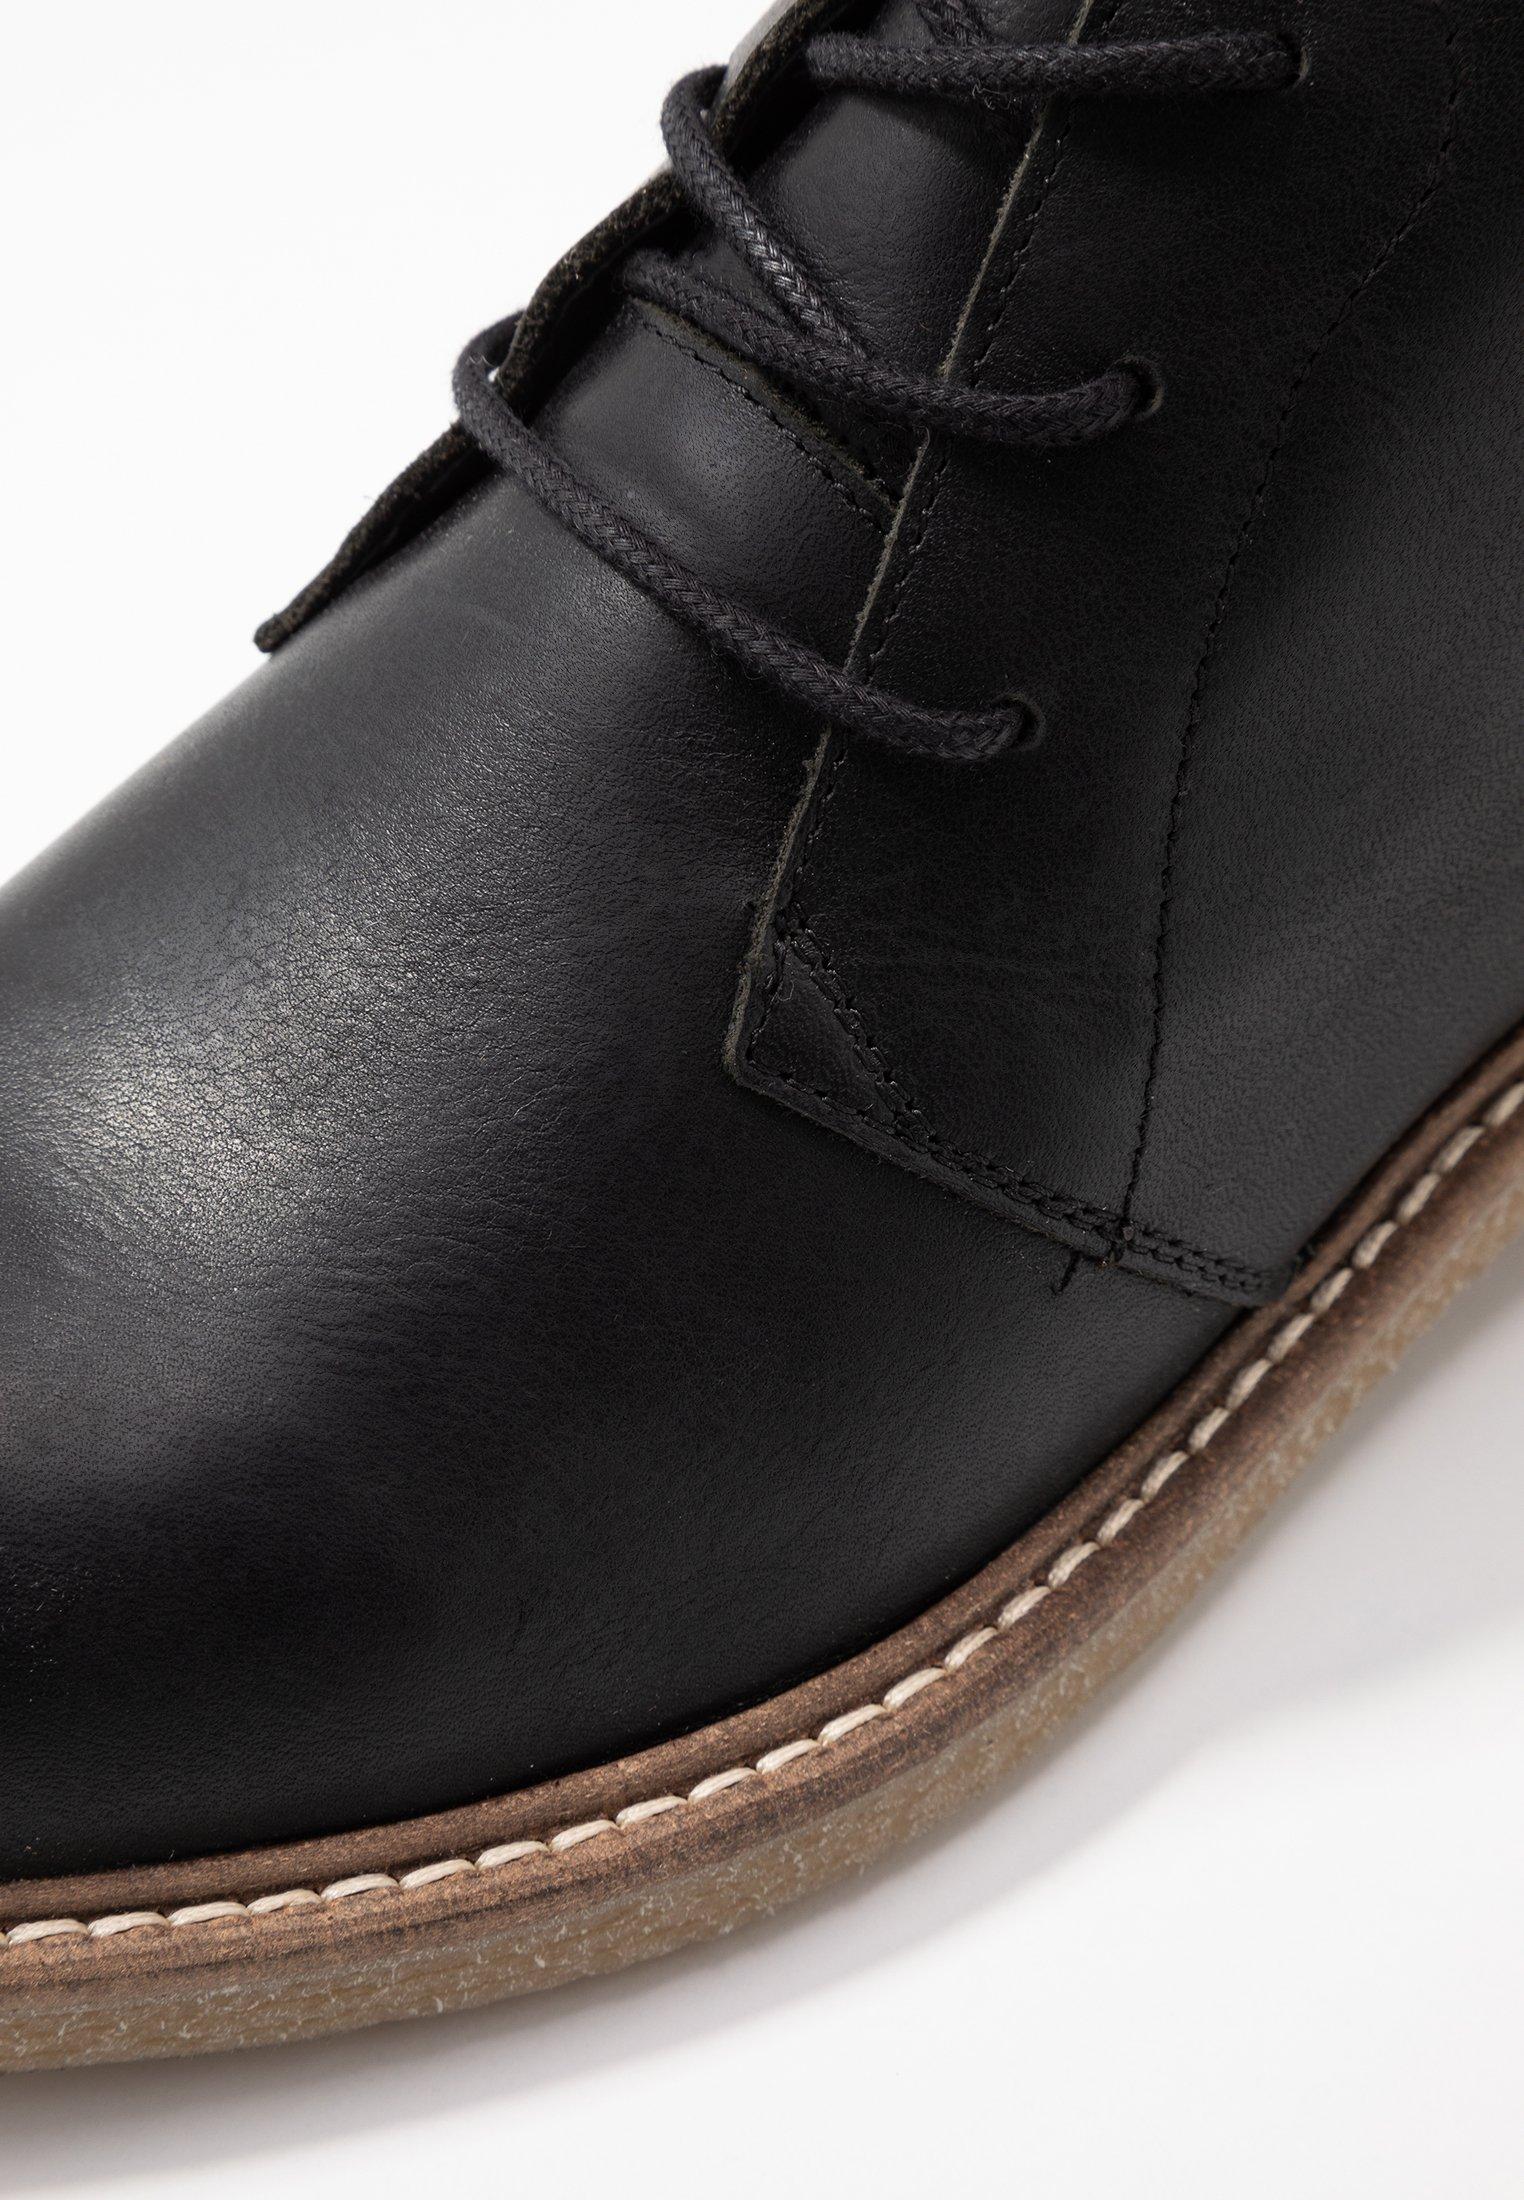 HUB TOMAR Ankle Boot black/schwarz